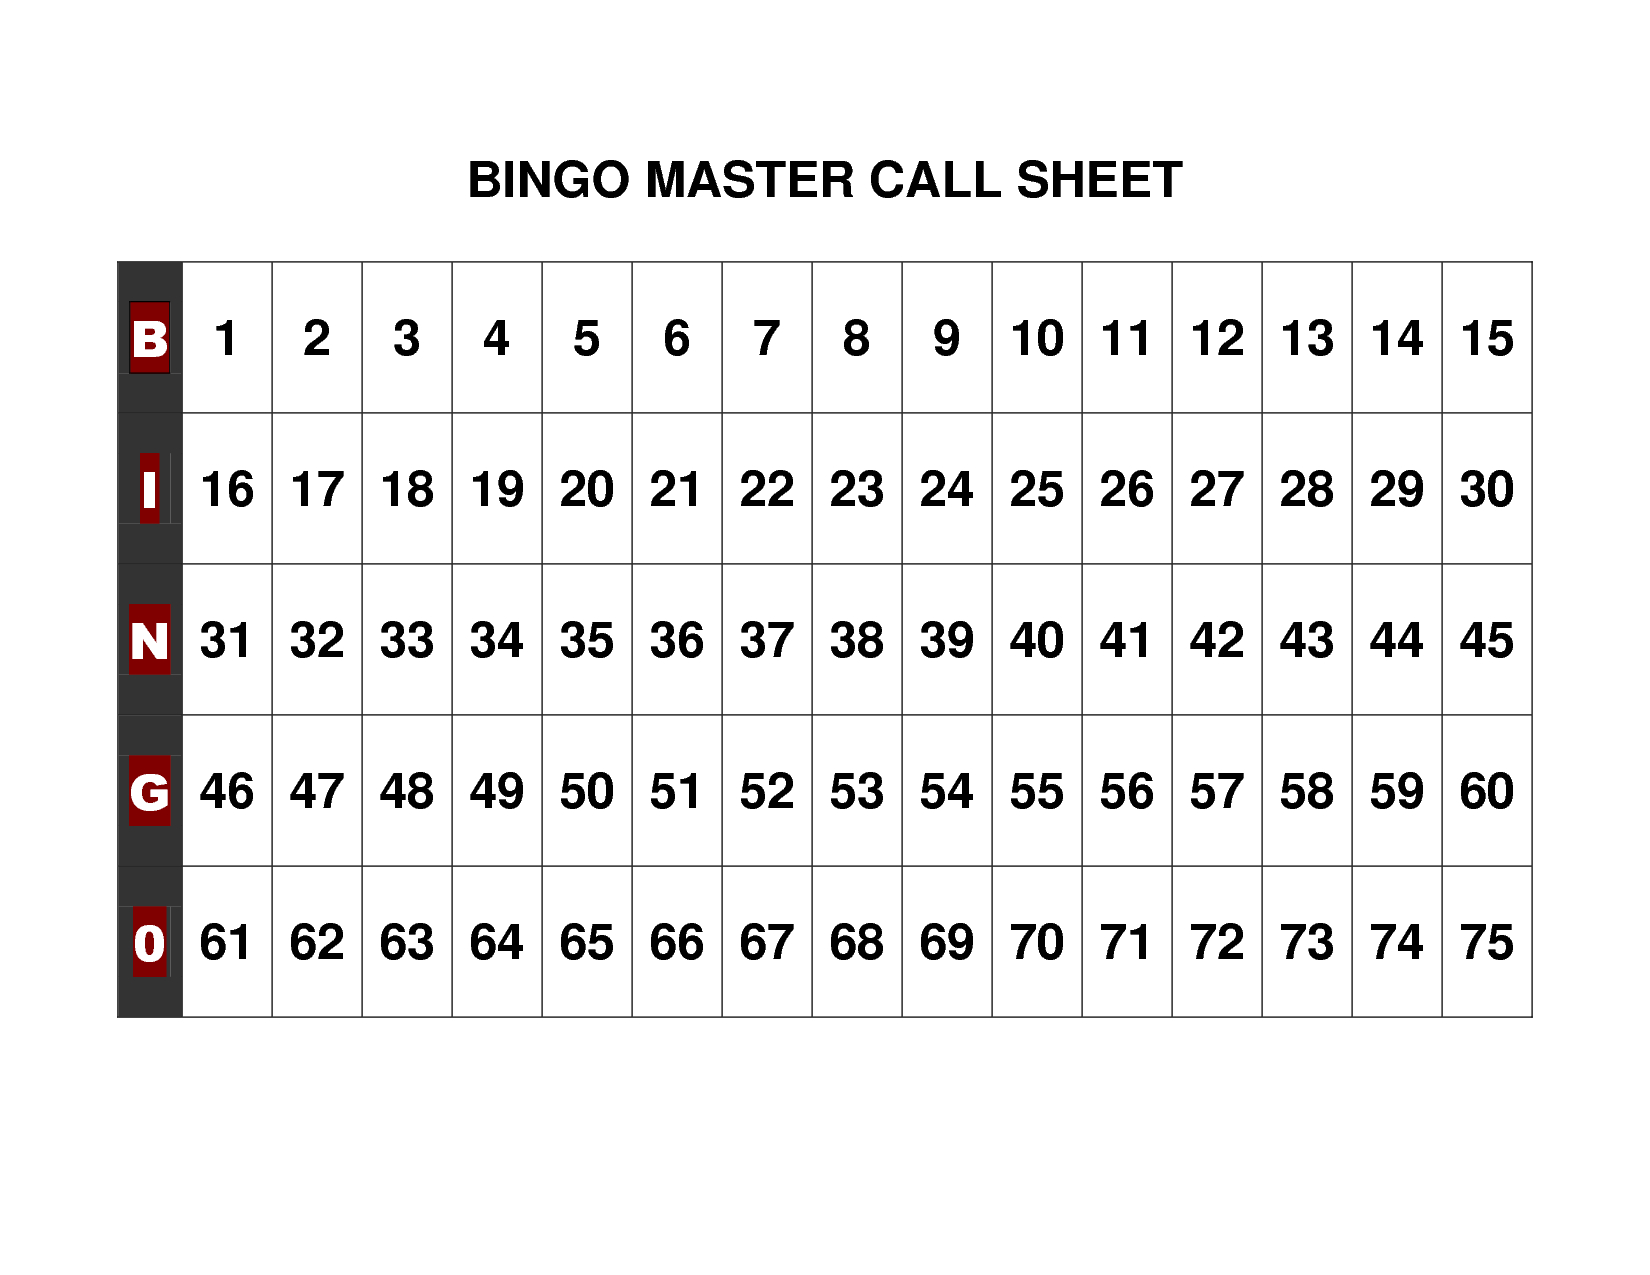 Free+Printable+Bingo+Call+Sheet | Bingo | Pinterest | Bingo, Bingo - Free Printable Bingo Cards Random Numbers